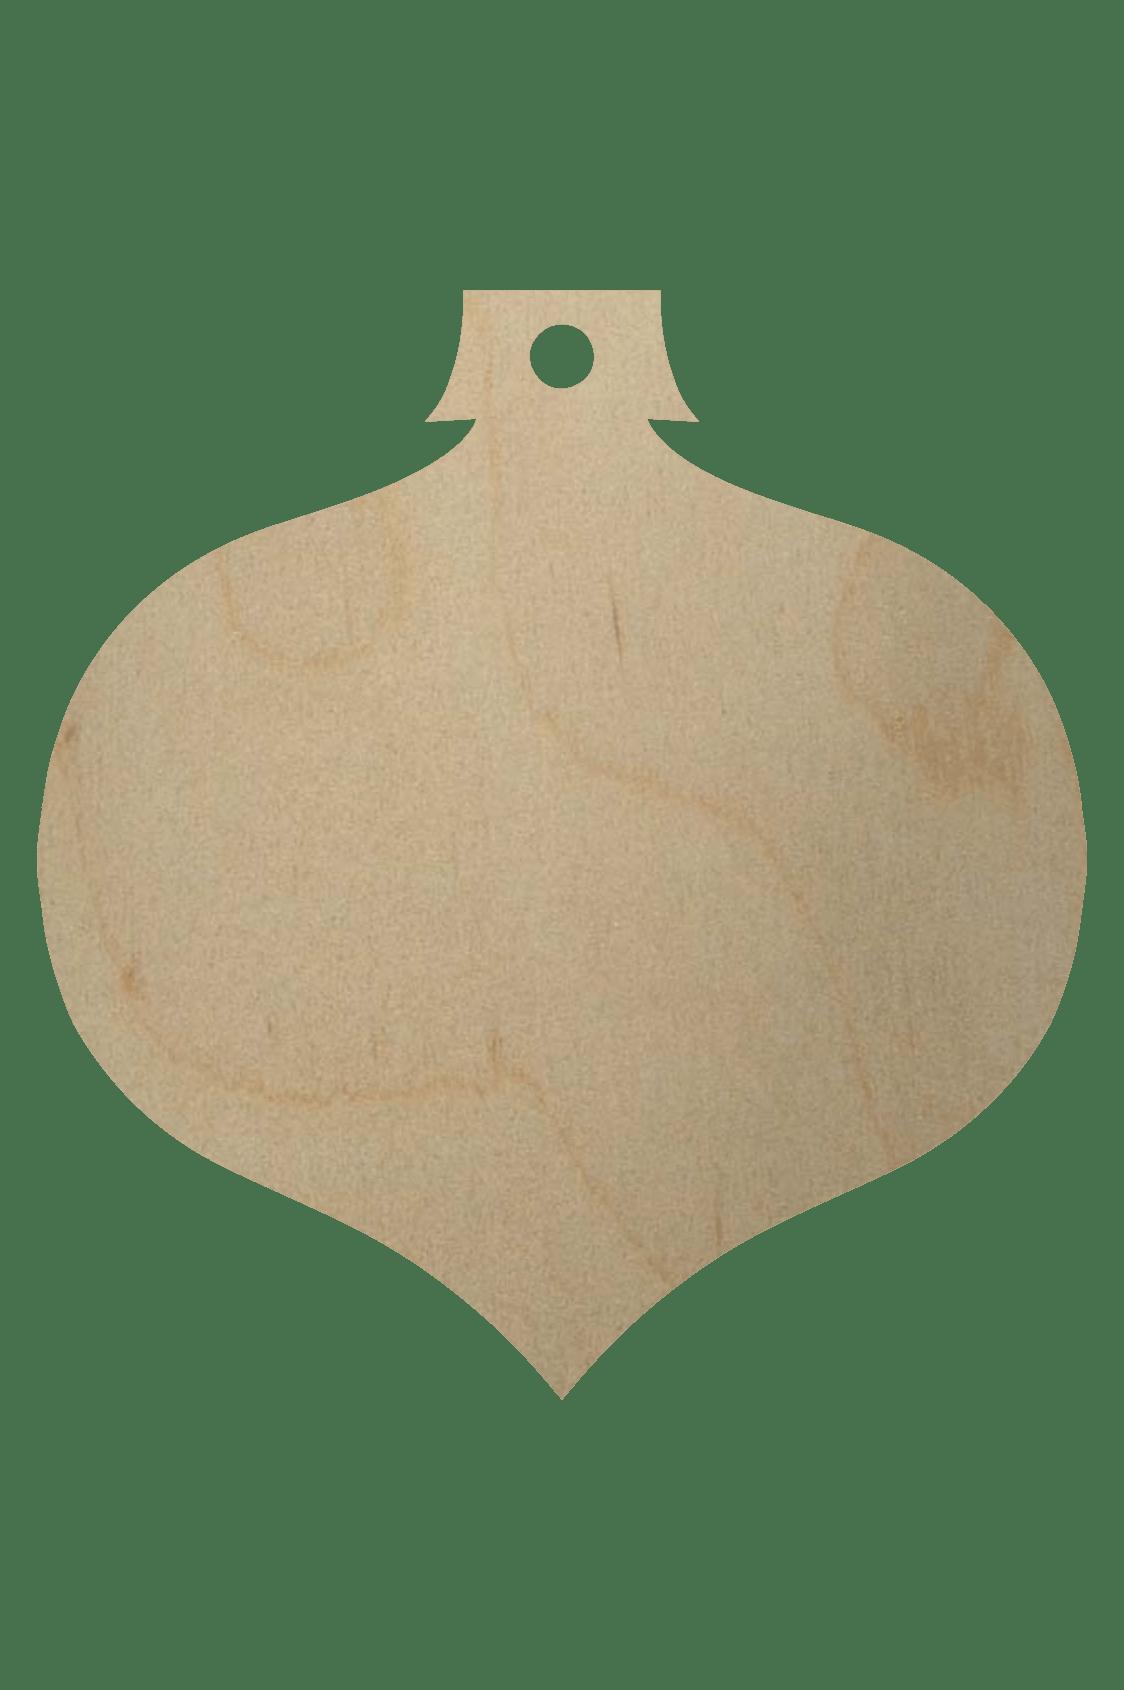 wooden christmas ornament shape